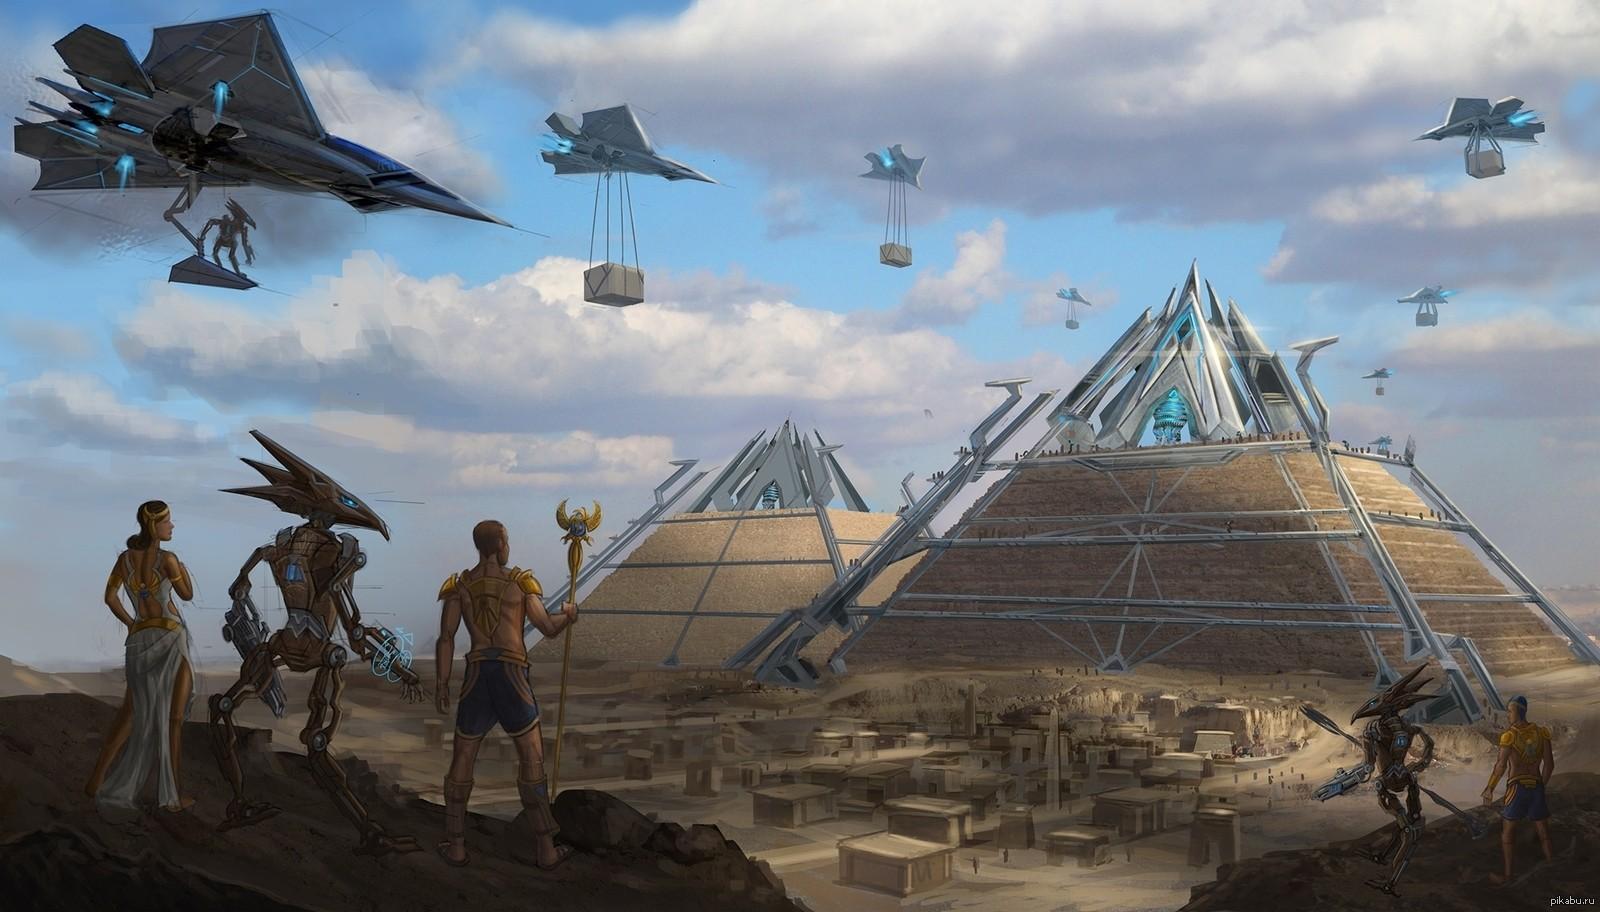 UFO_Egypt_pyramid_spaceship_science_fiction_fantasy_art_artwork-94764.jpg!d